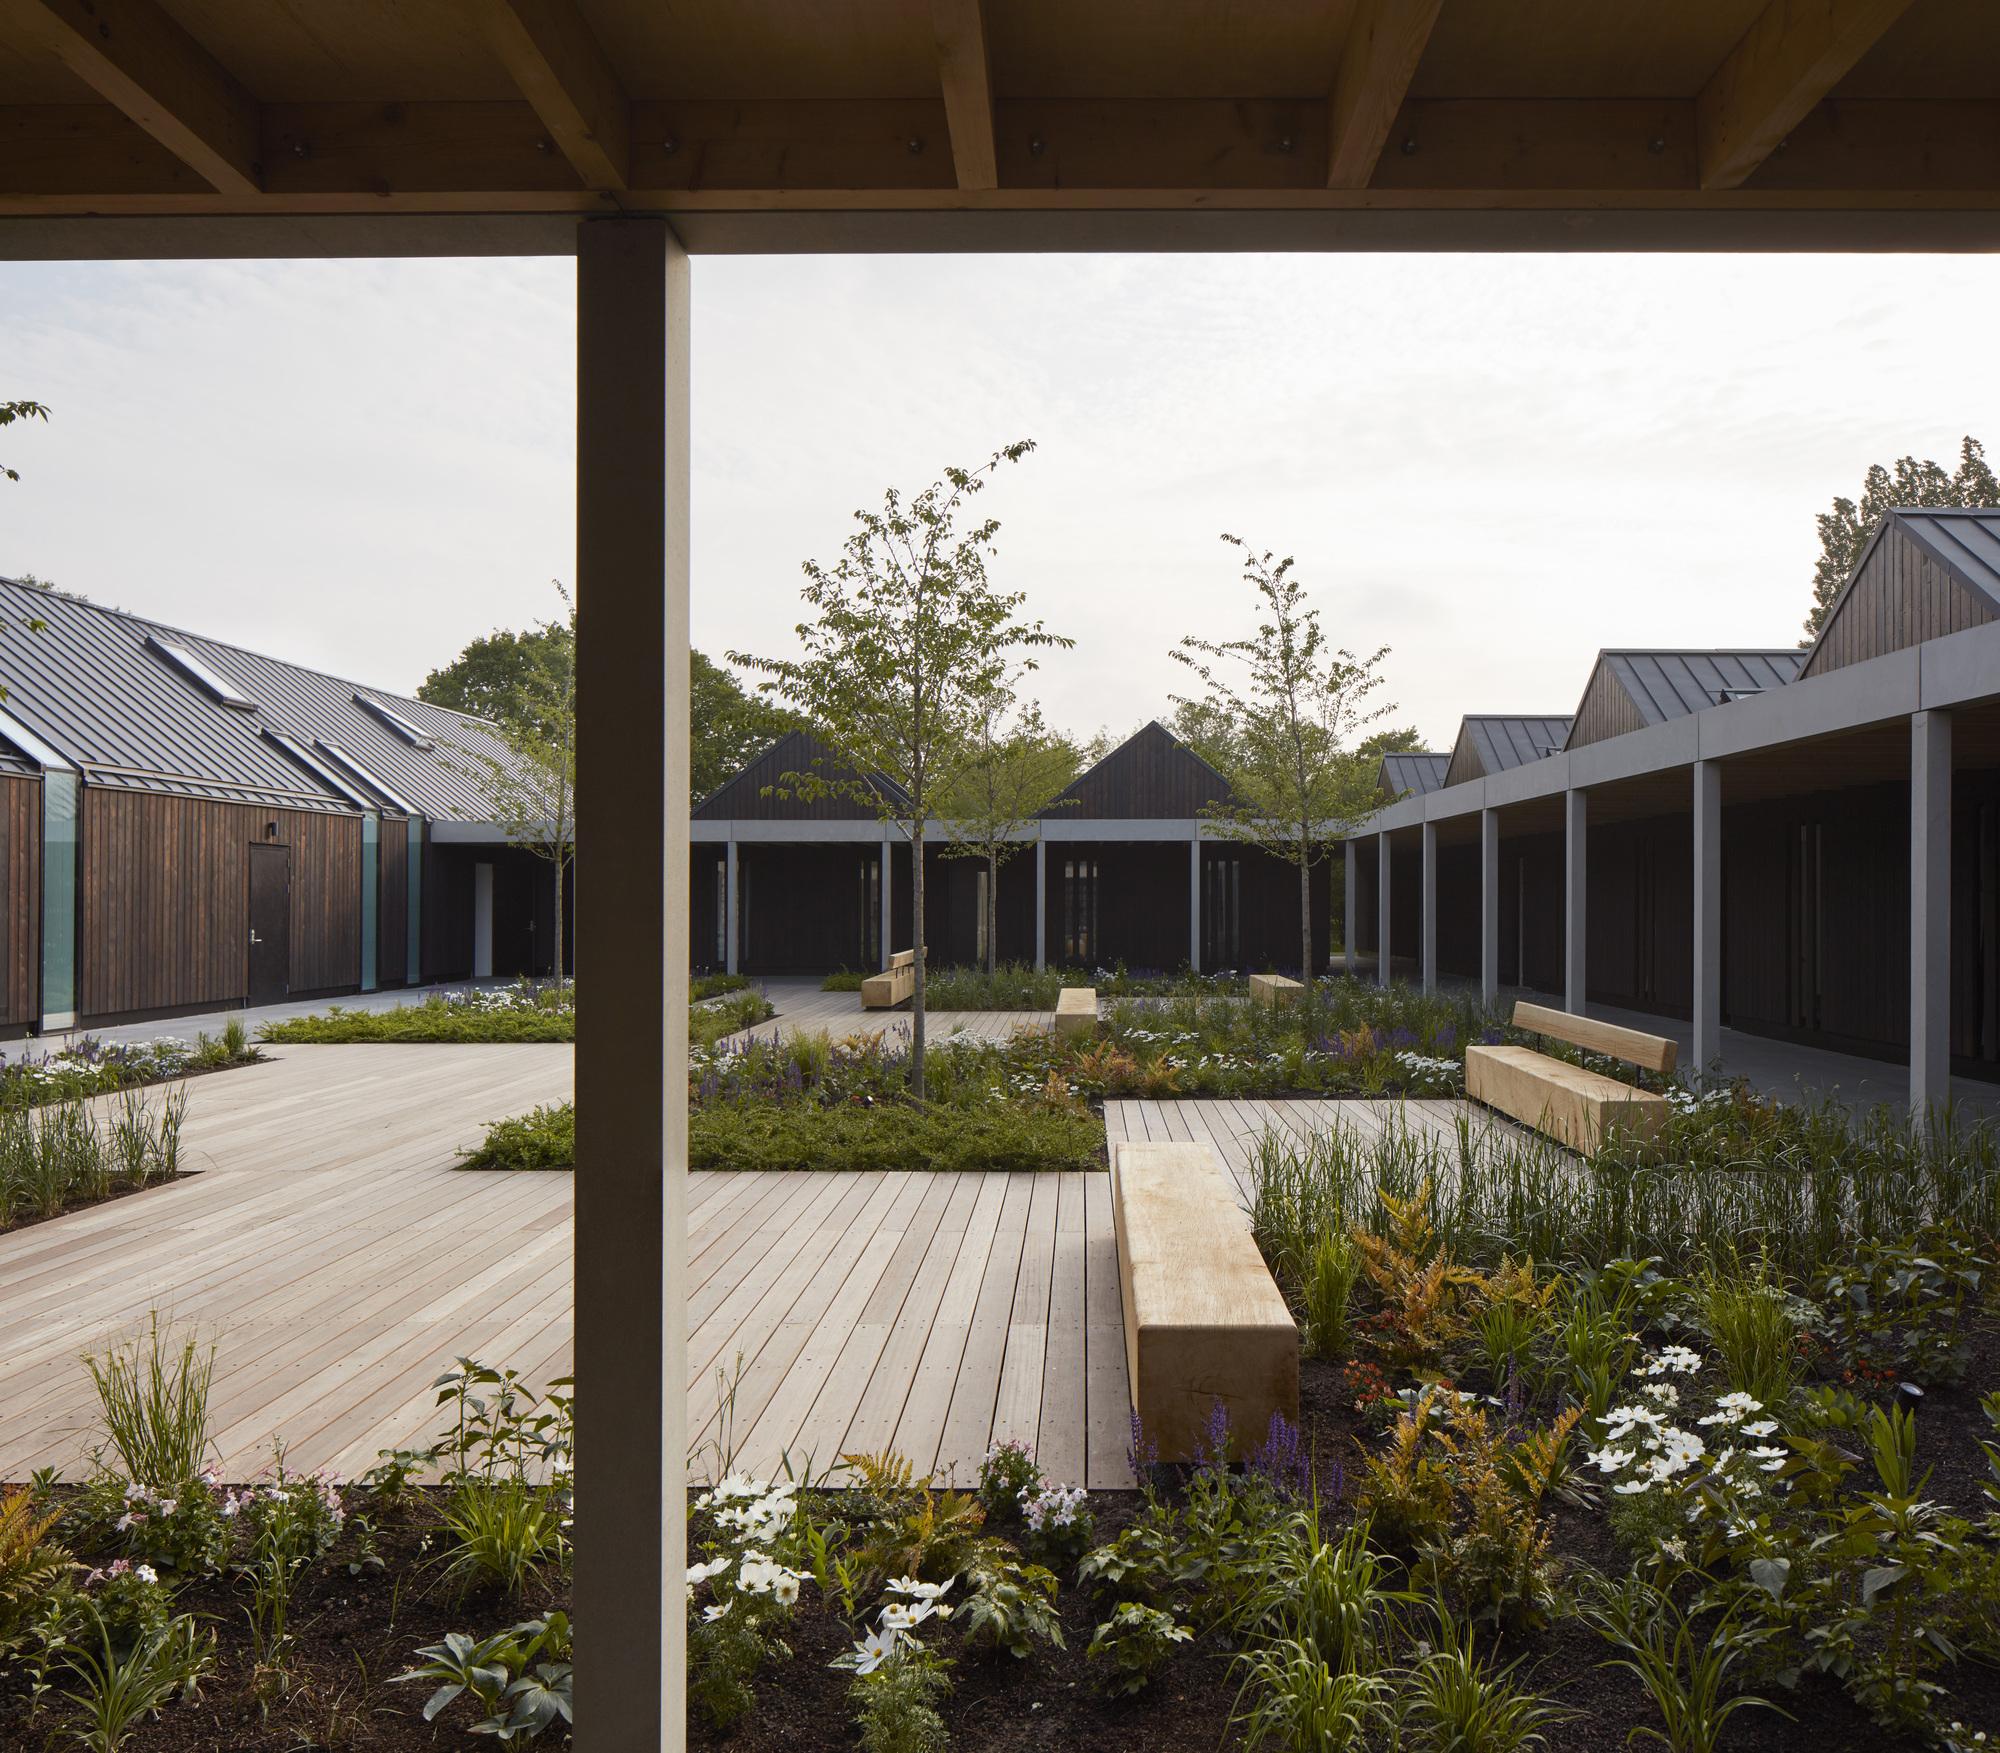 Vajrasana Buddhist Retreat / Walters & Cohen Architects